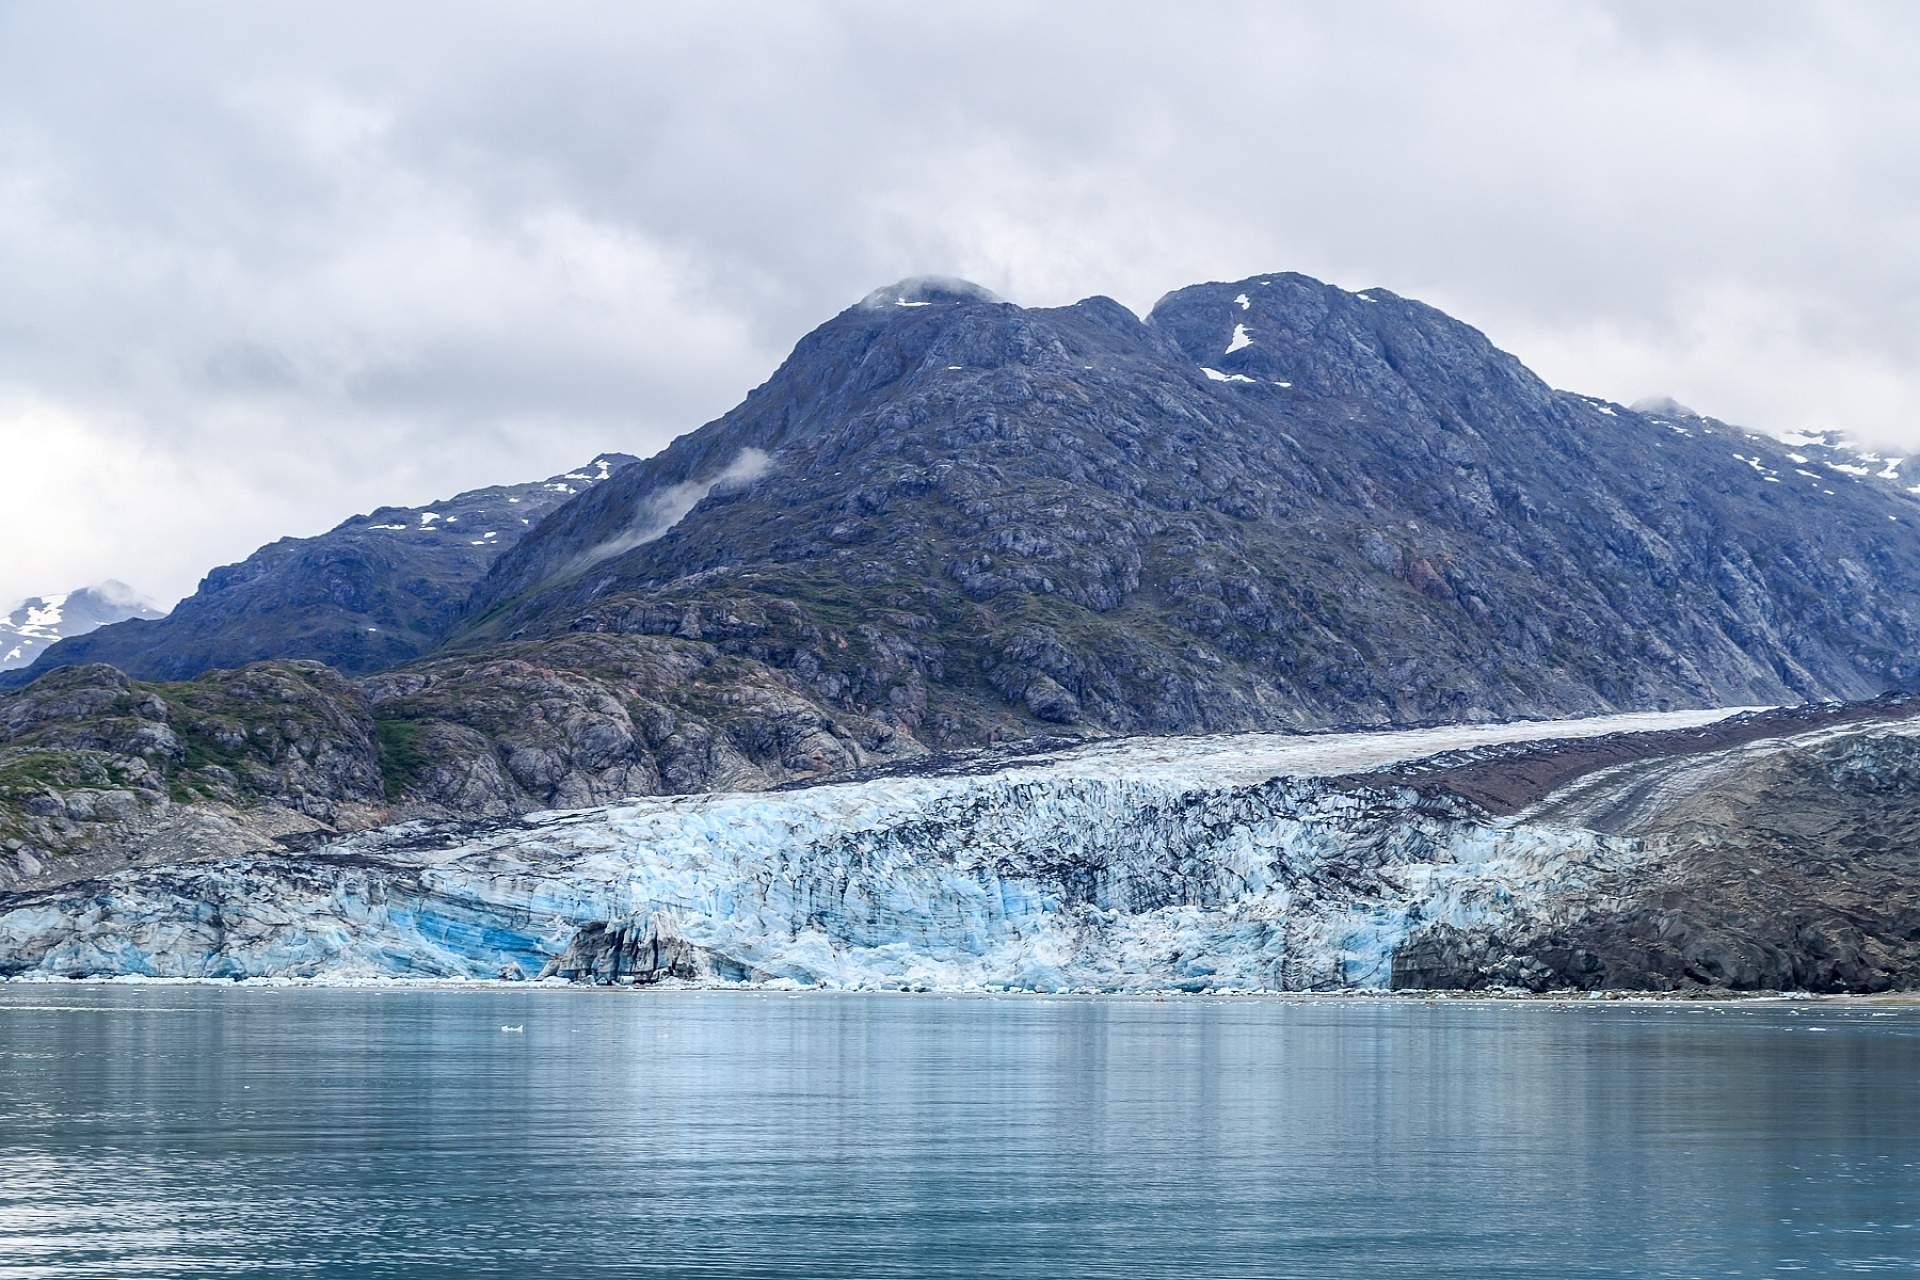 View of a tidewater glacier in Glacier Bay National Park